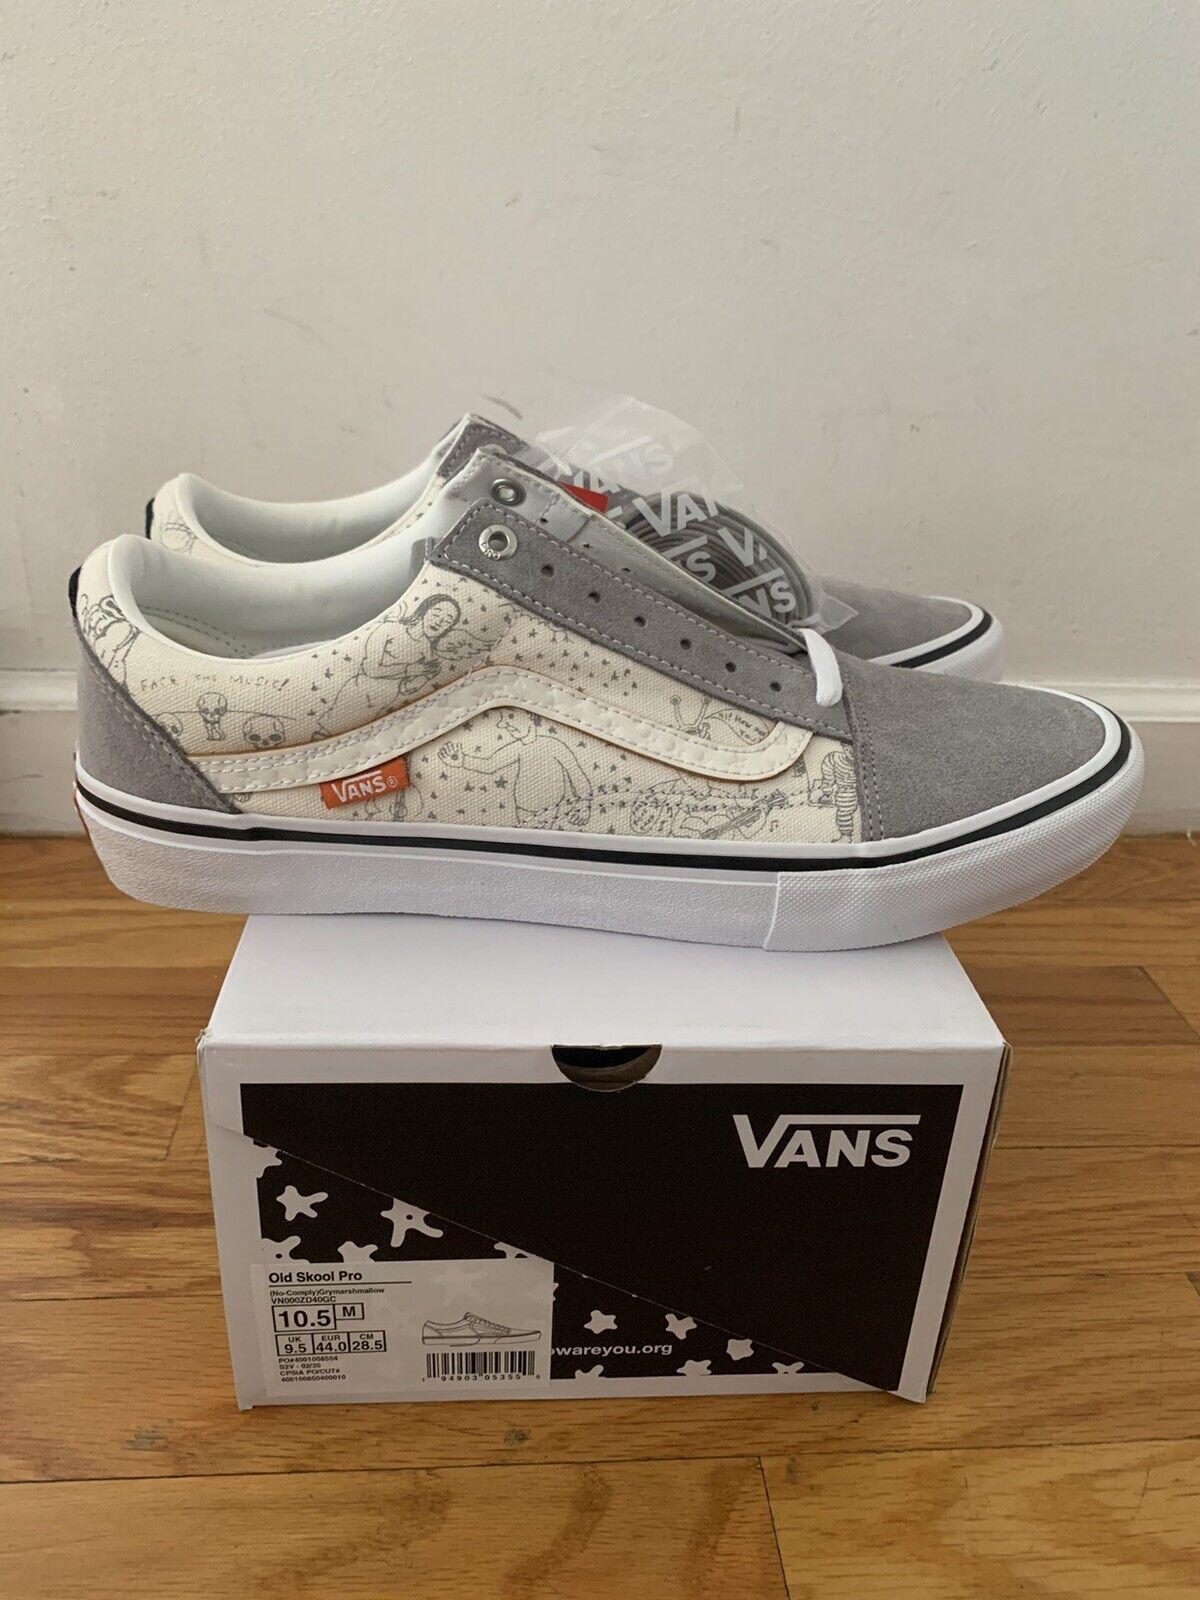 Vans X Size Uk Old Skool Wool Pack For Sale Online Ebay